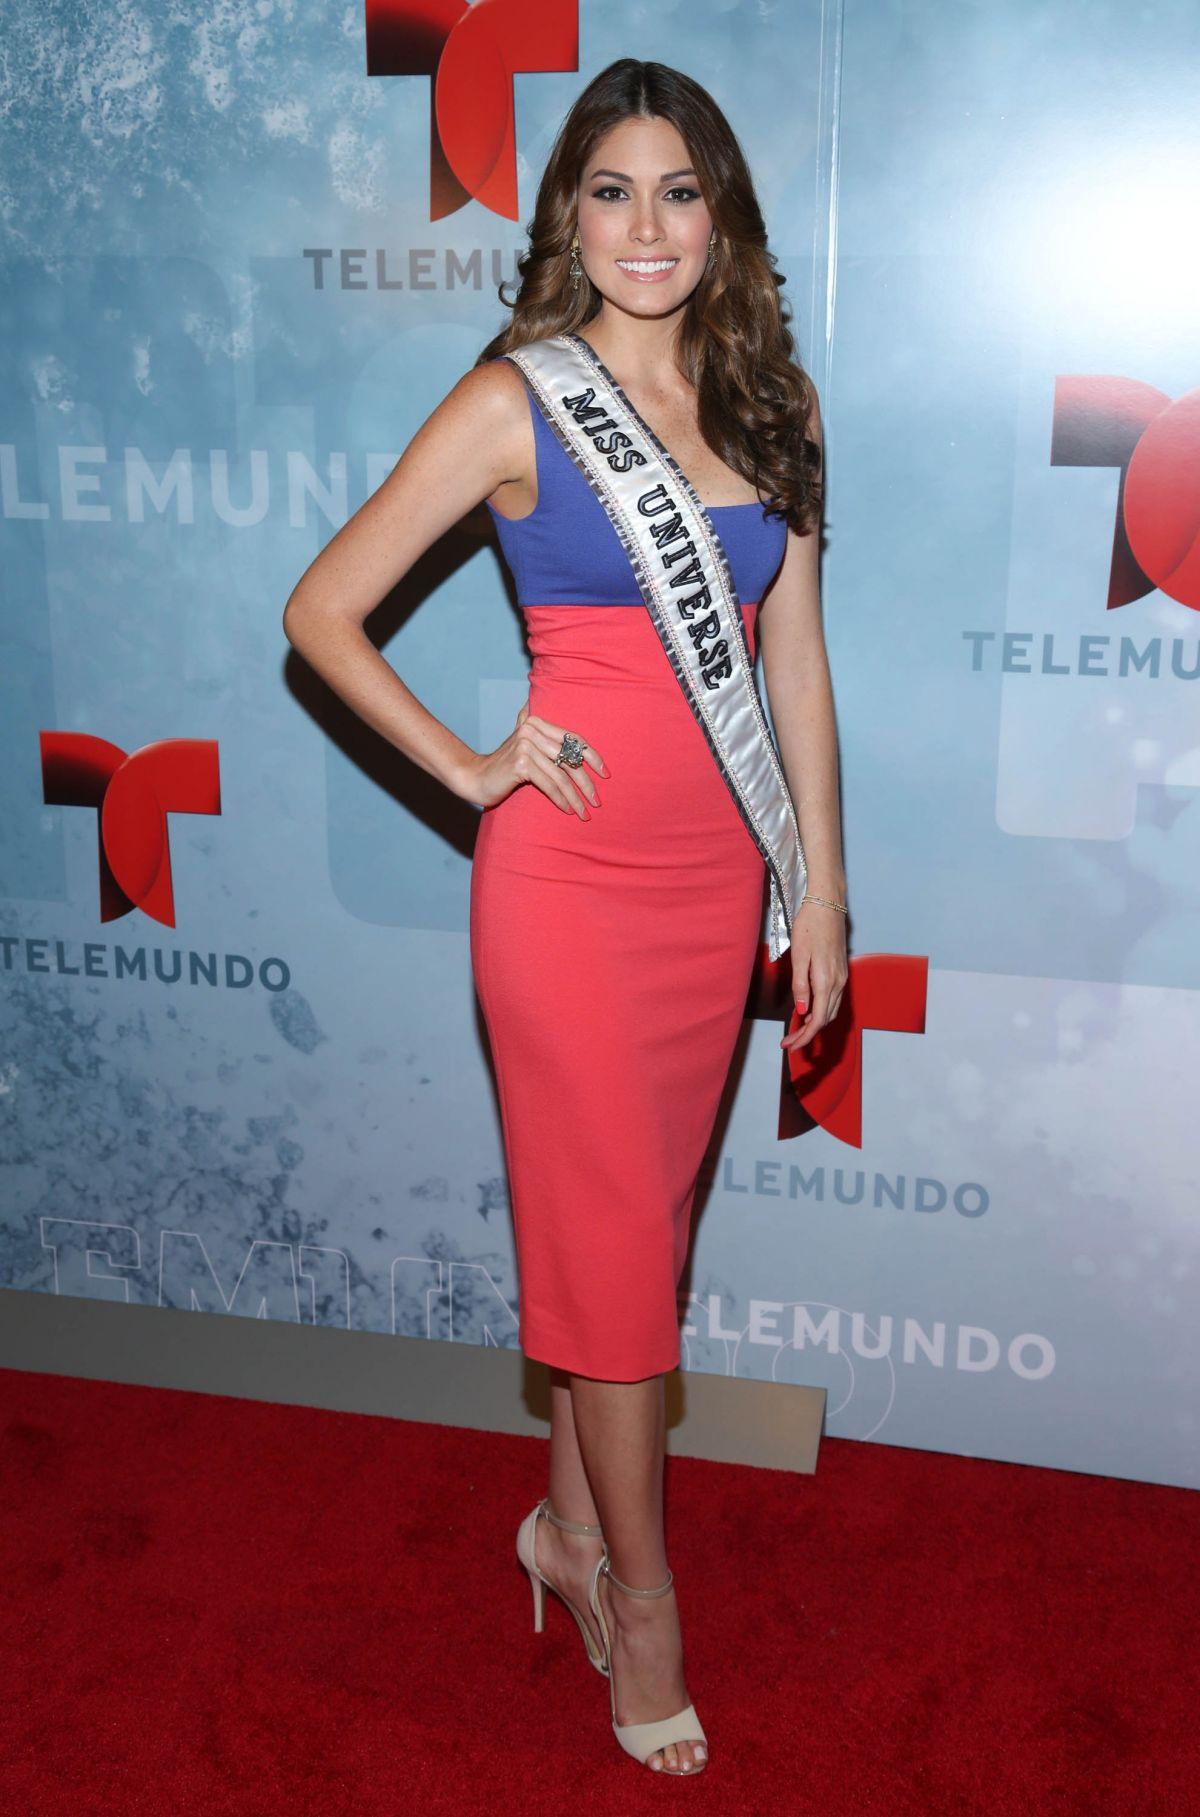 GABRIELA ISLER at Telemundo Upfront 2014 in New York